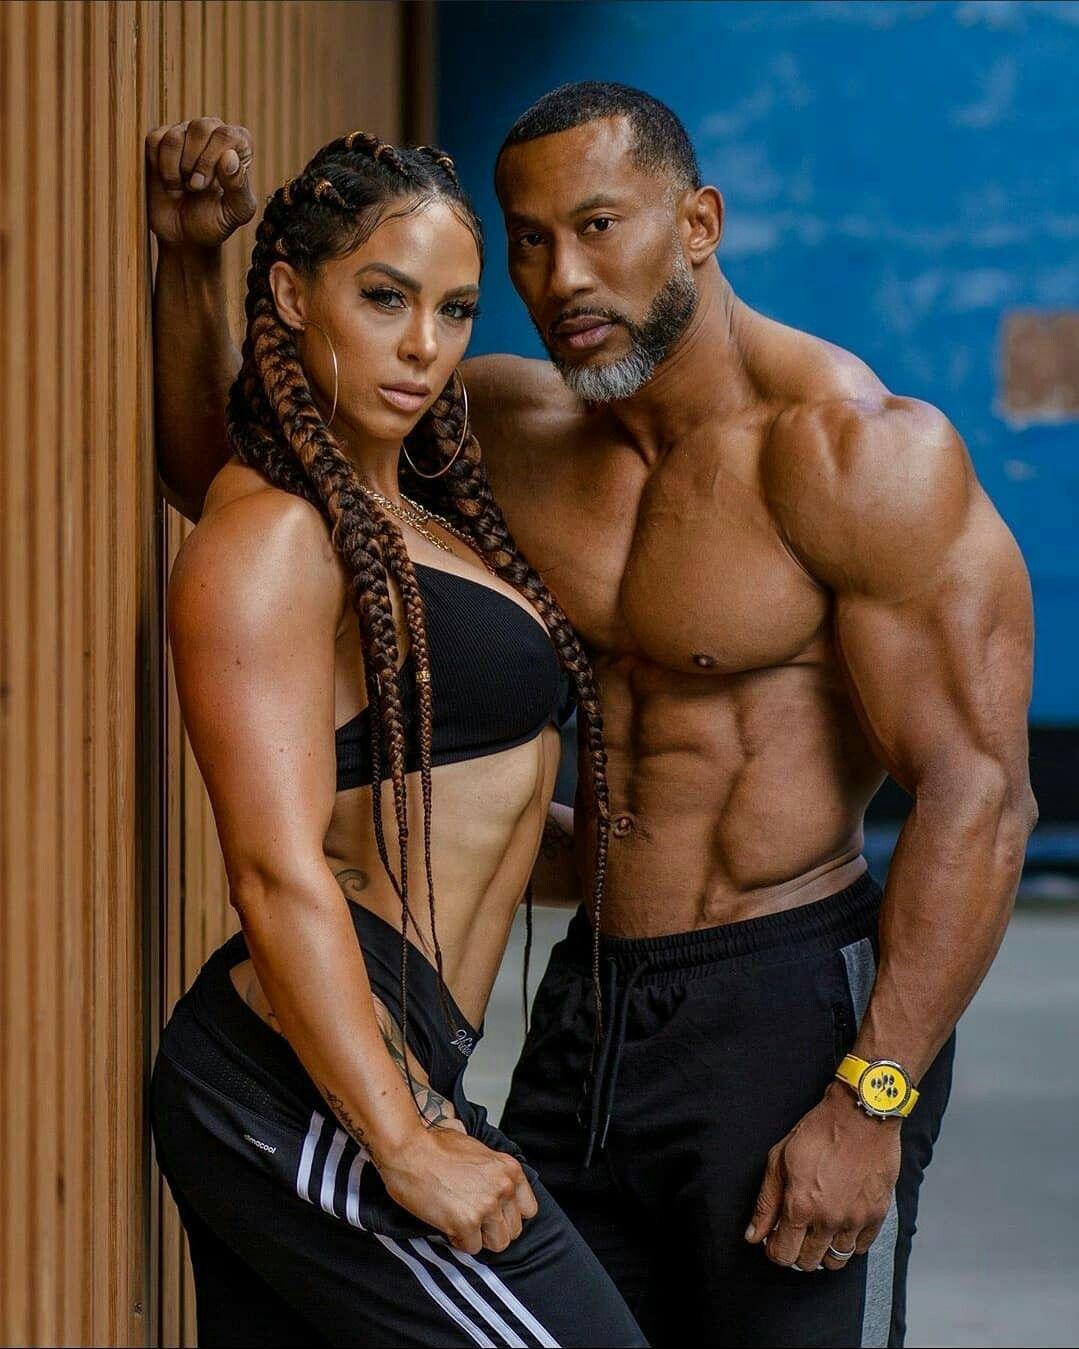 Fitness Couple Motivation Pics